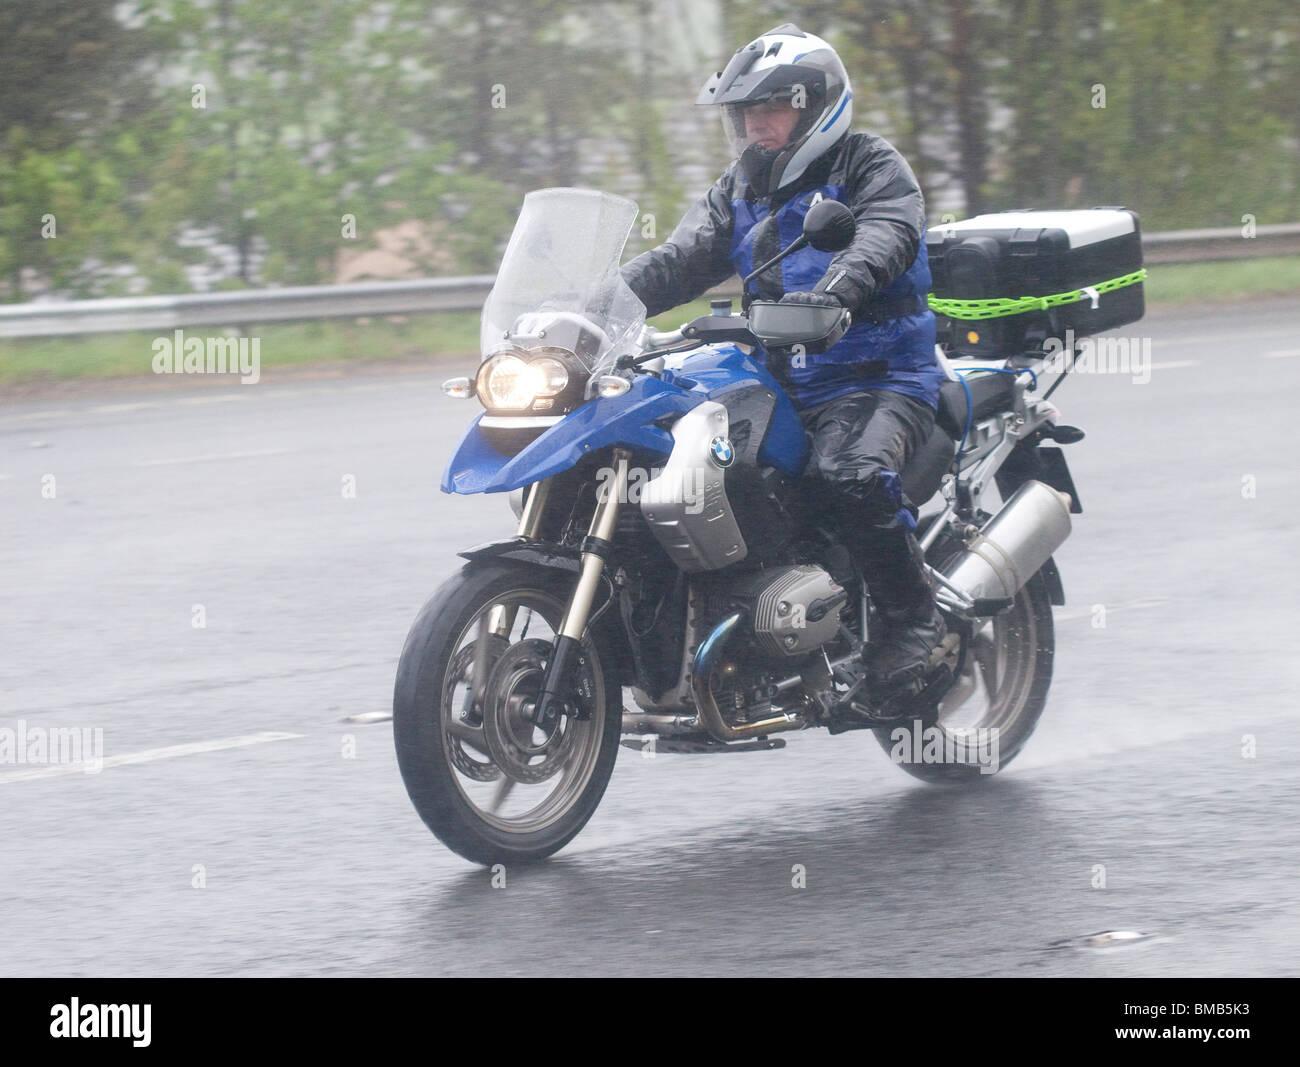 Bad weather rain mist spray dark road touring motorbike with a wet motorcyclist summer UK - Stock Image